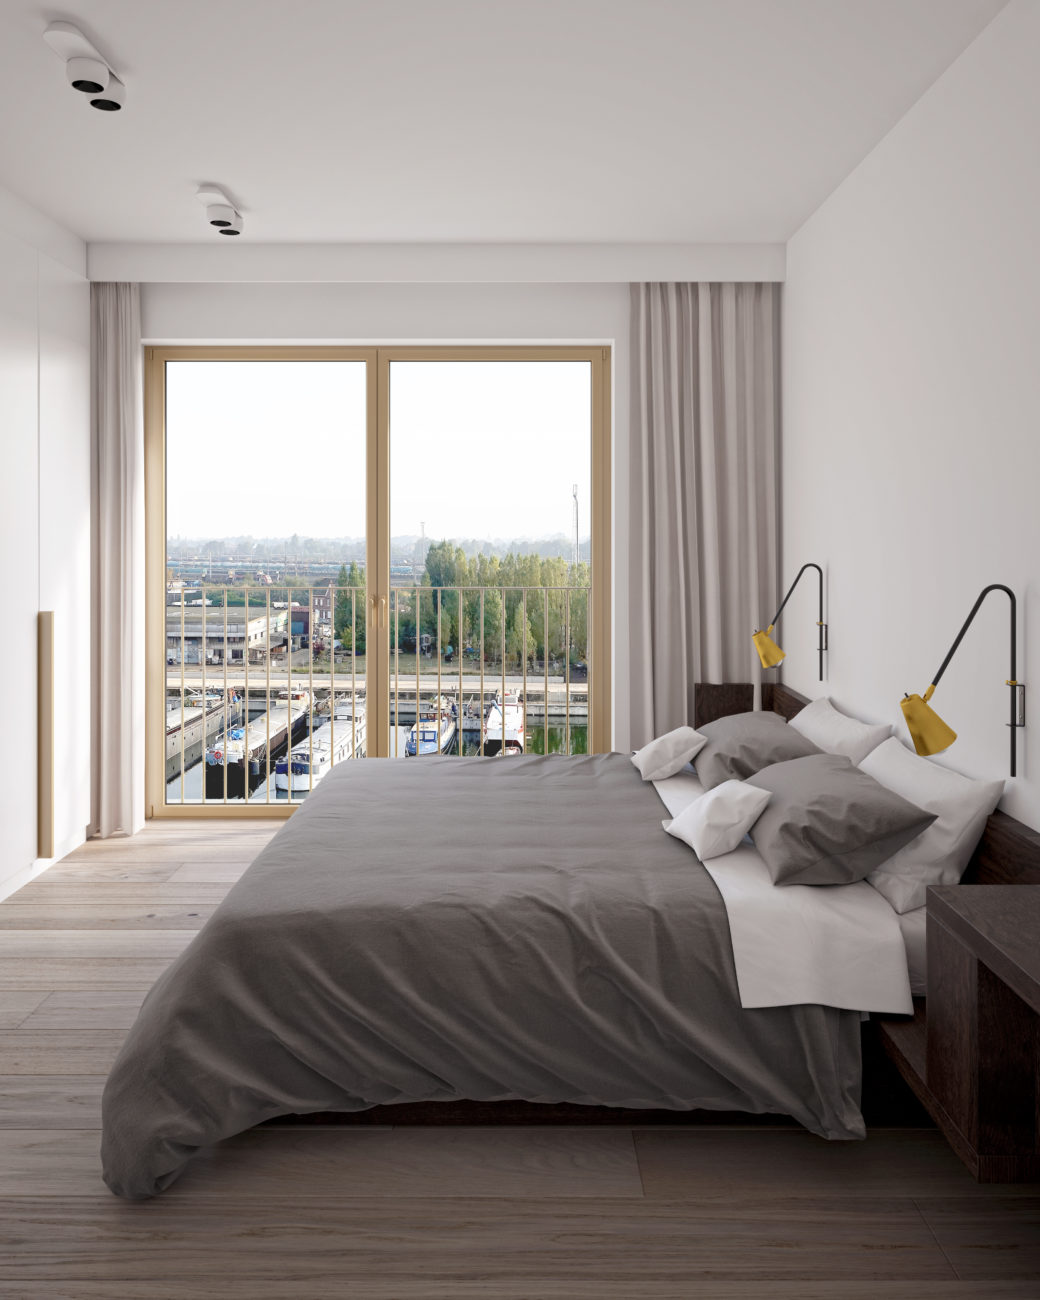 Stapelplein Gent Interieur Slaapkamer